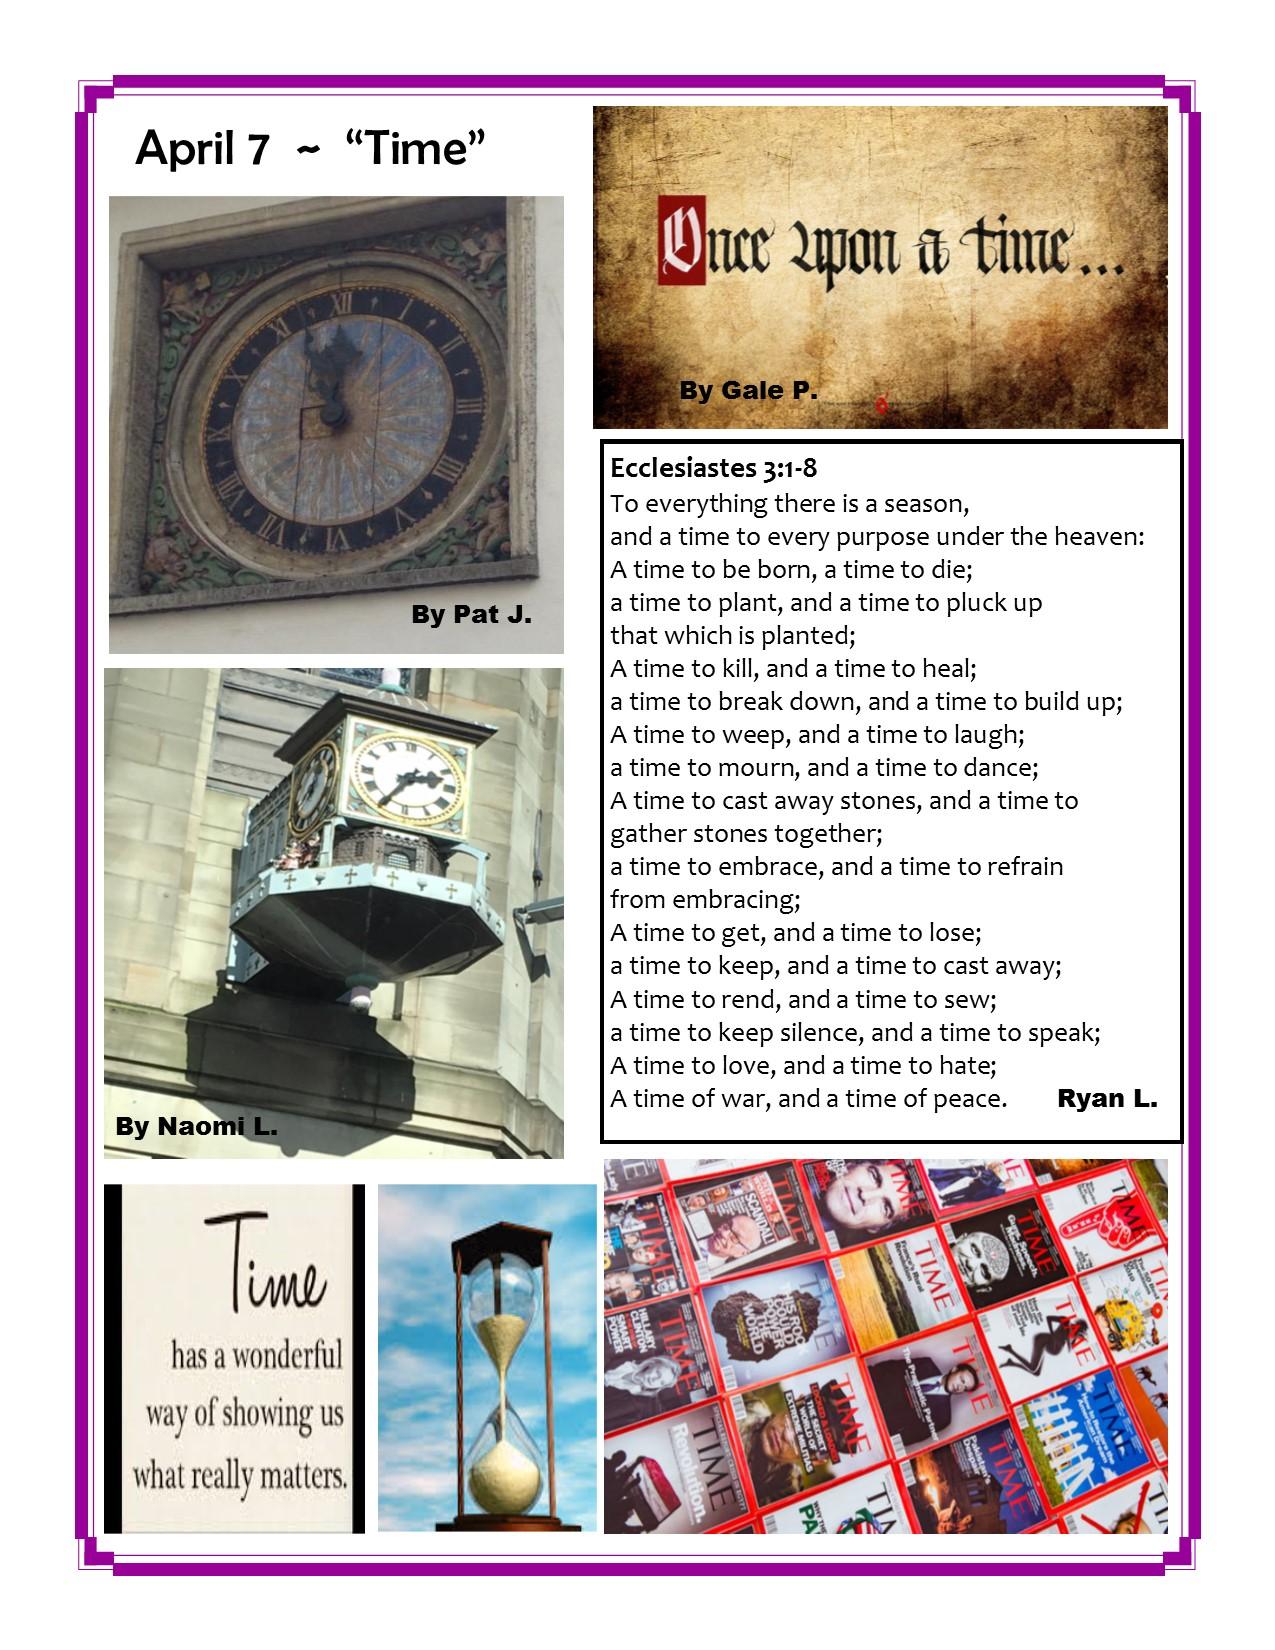 April 7, Time.jpg